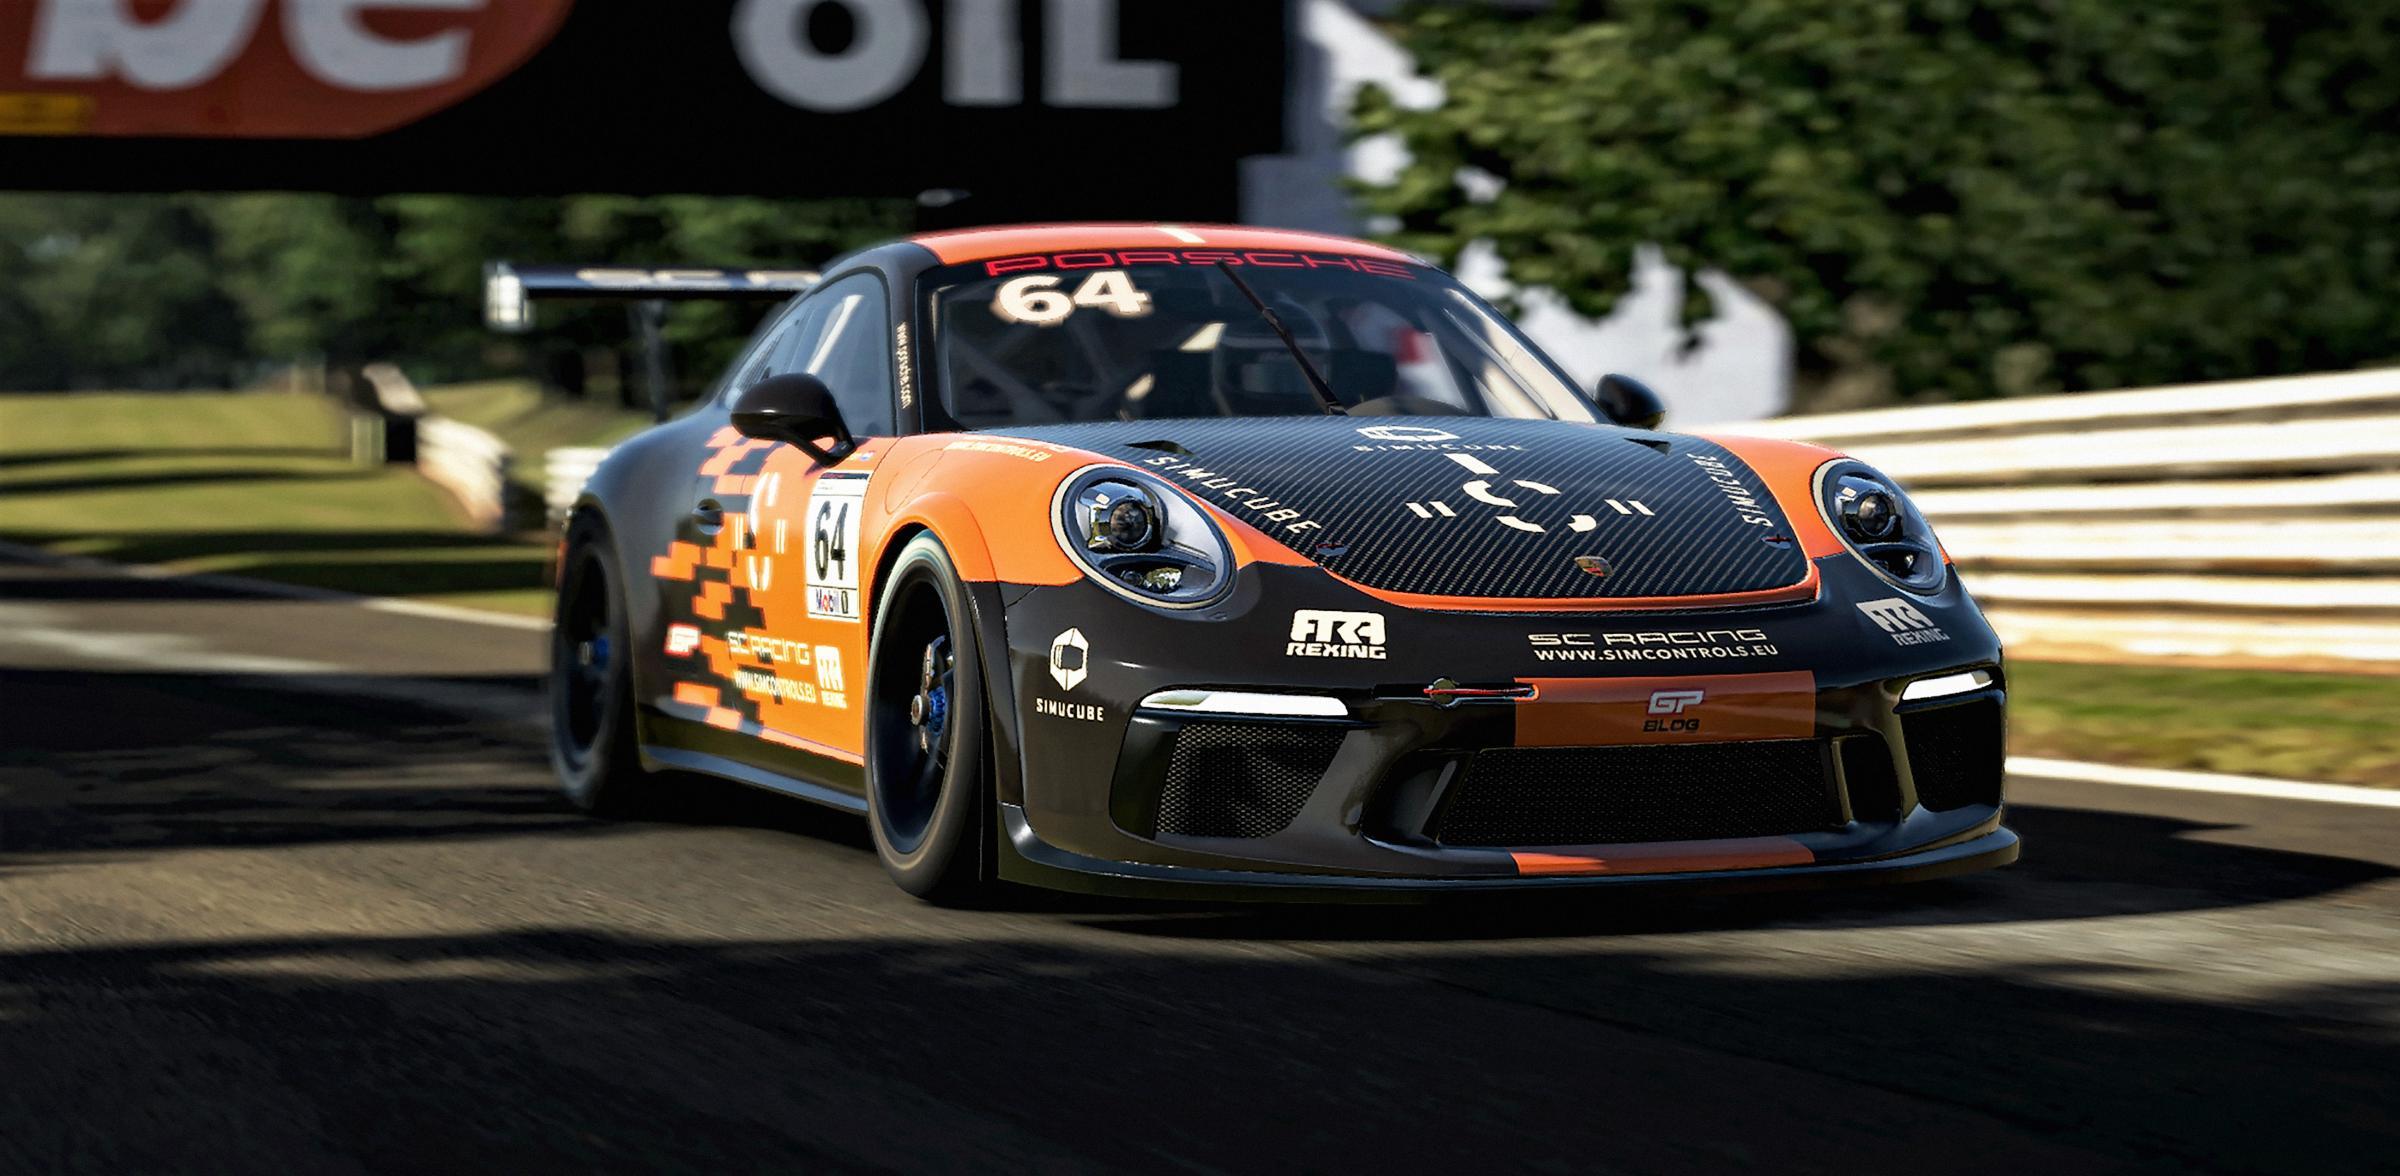 Preview of Porsche 911 Cup  No Name by simcontrols.eu by David Plasman